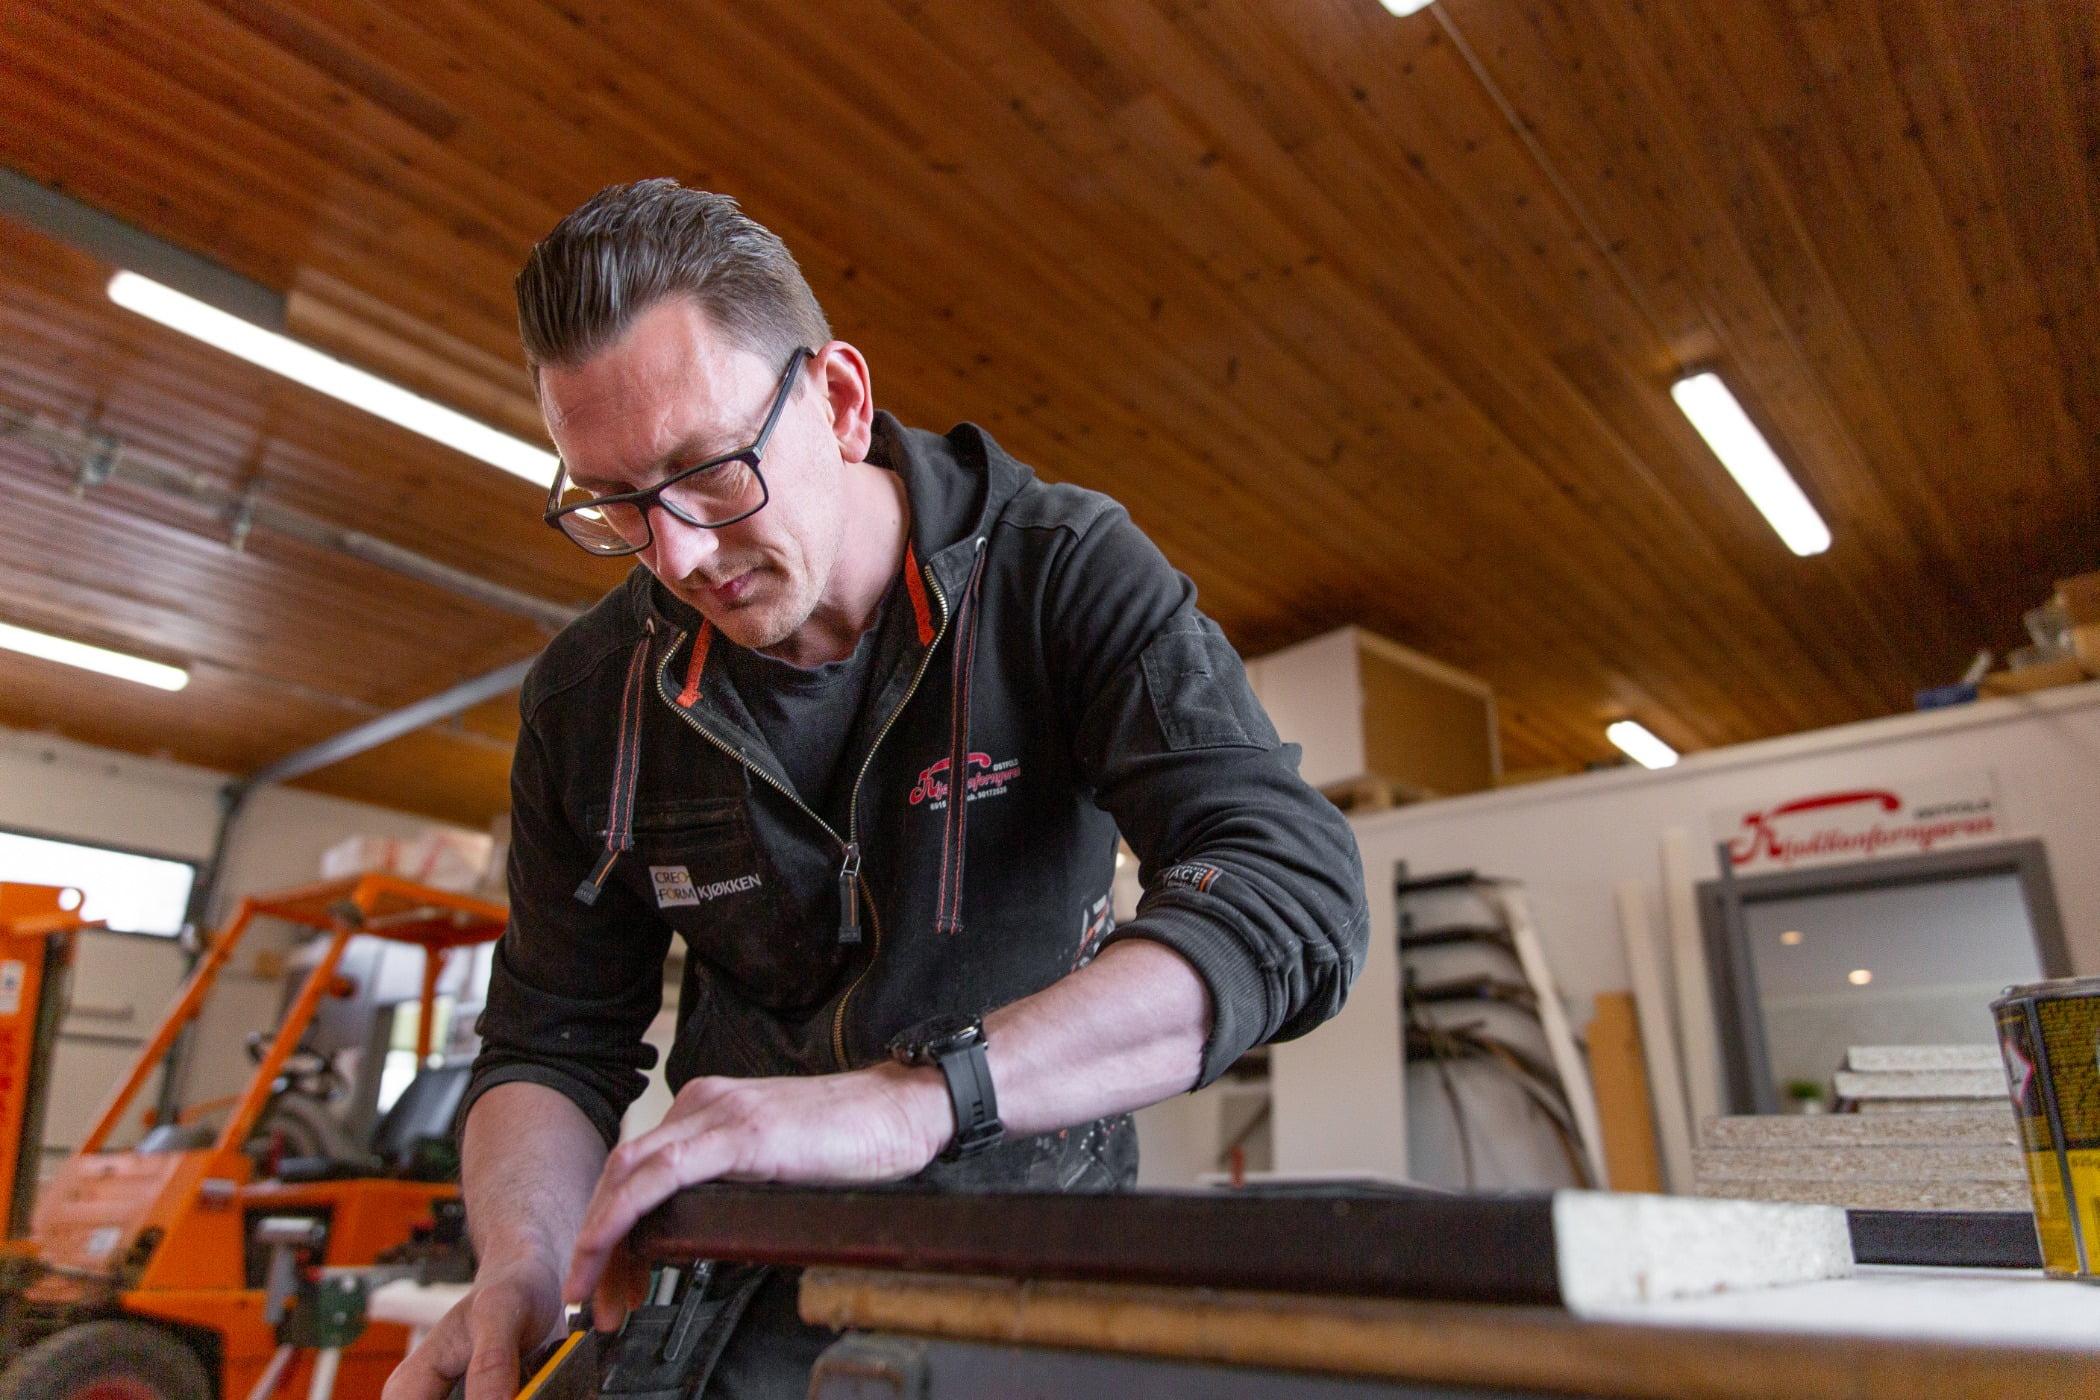 Automotive design, Glasses, Workwear, Wood, Engineer